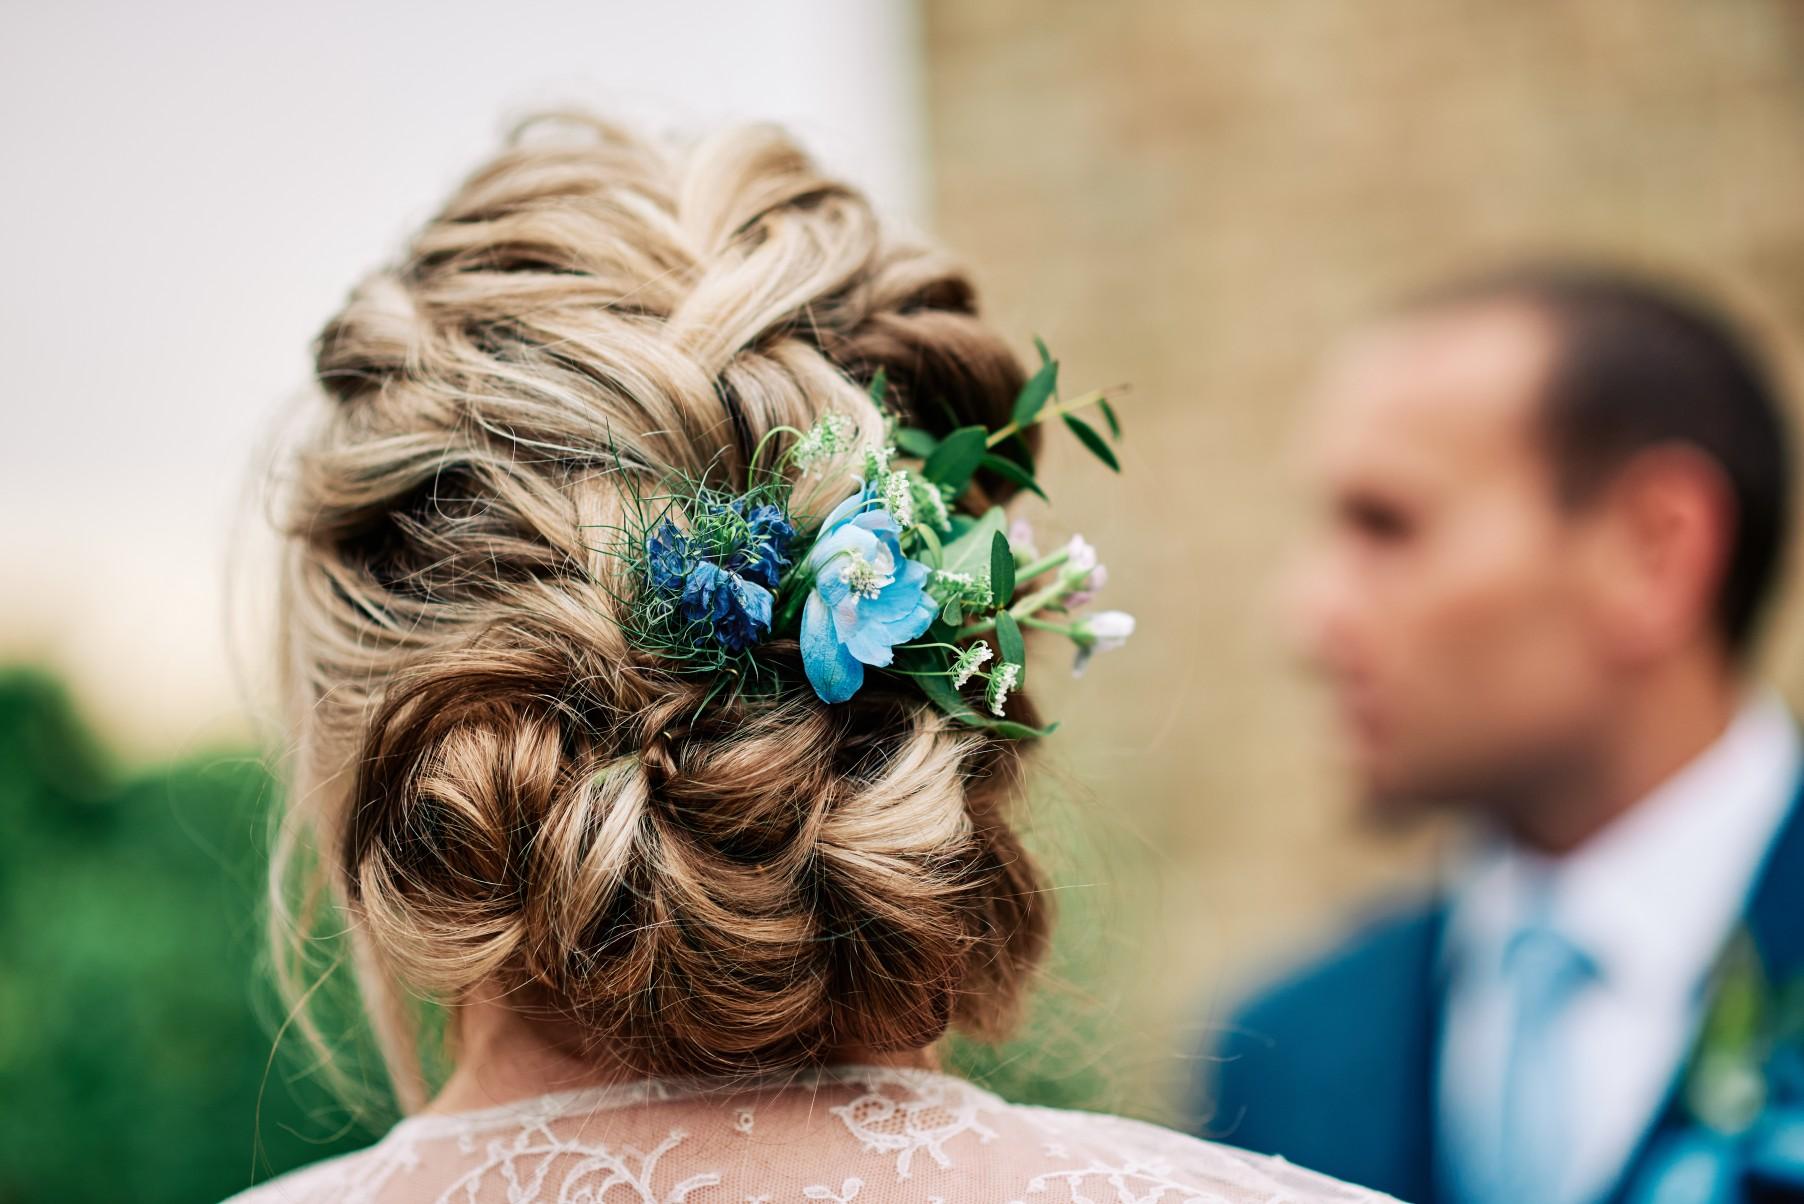 nhs wedding - paramedic wedding - blue and gold wedding - outdoor wedding - micro wedding - surprise wedding - celebrant wedding ceremony- blue flower in bride's hair